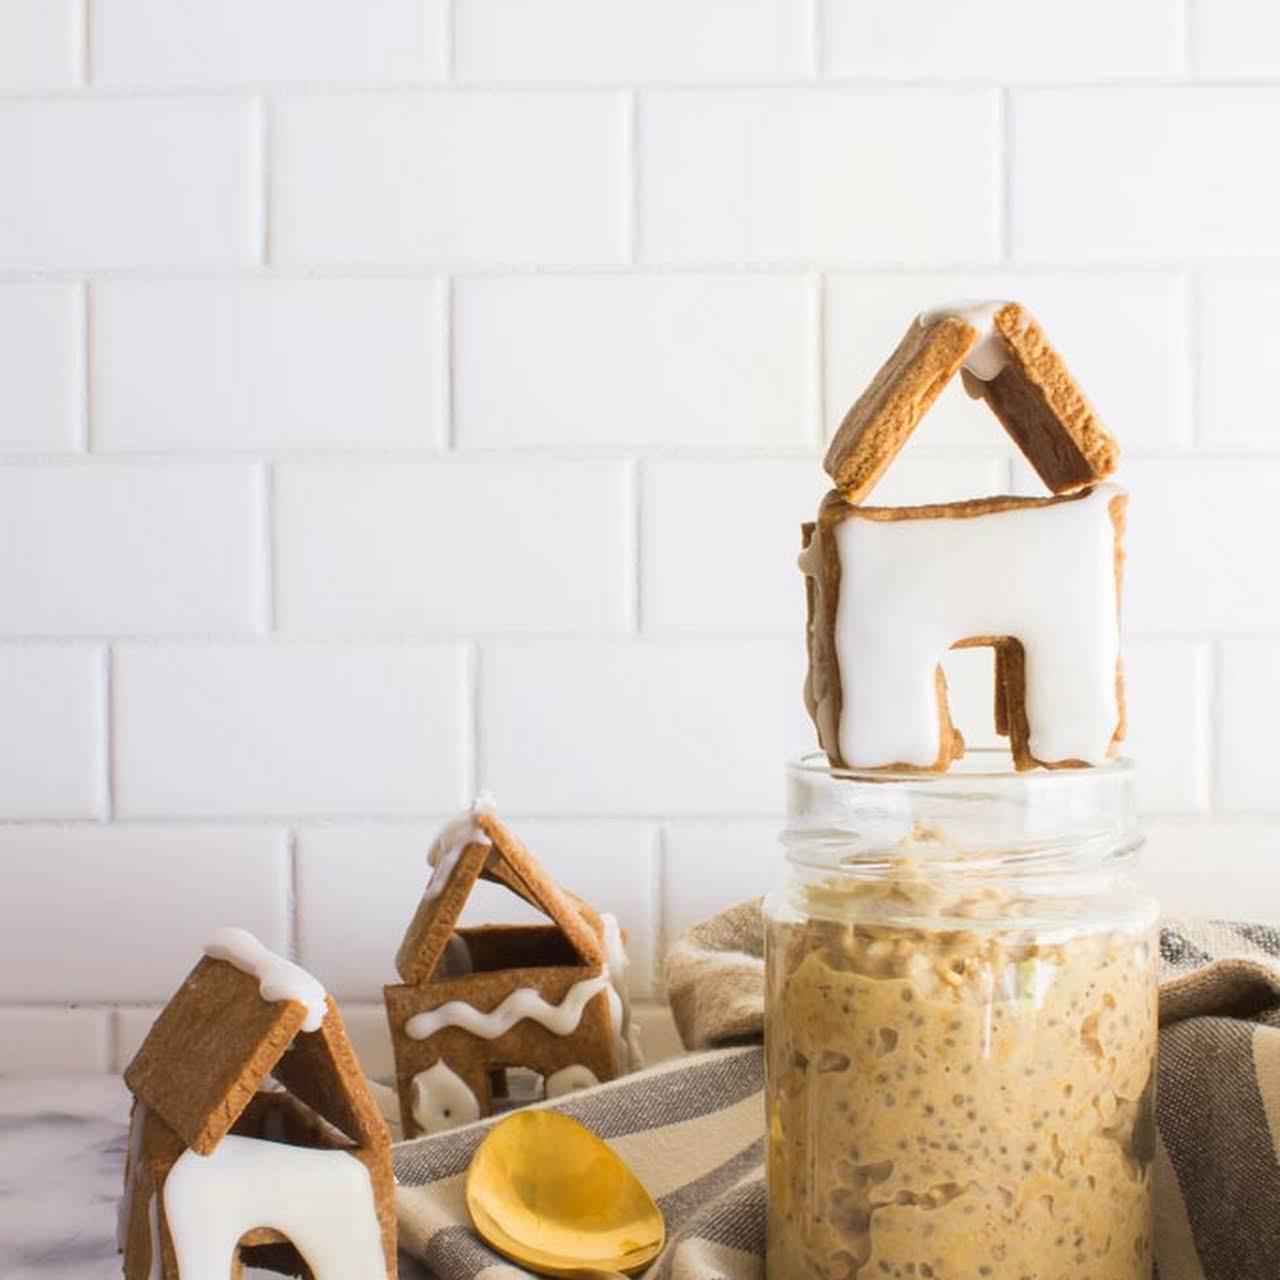 Gingerbread Overnight Oats (+ a mini gingerbread house!)